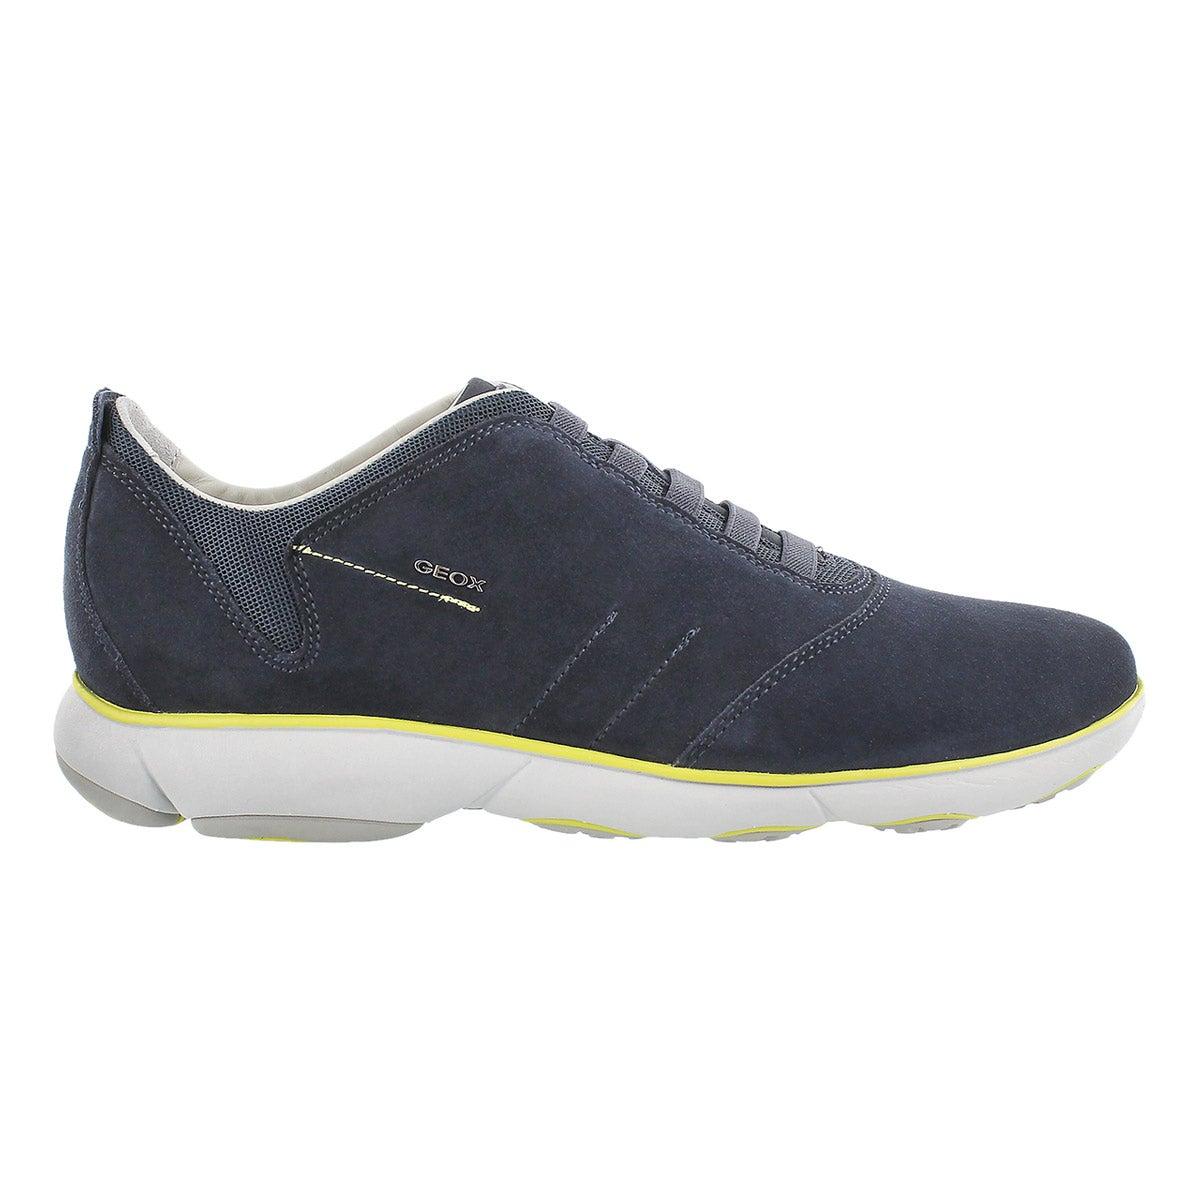 Mns Nebula navy lace up running shoe